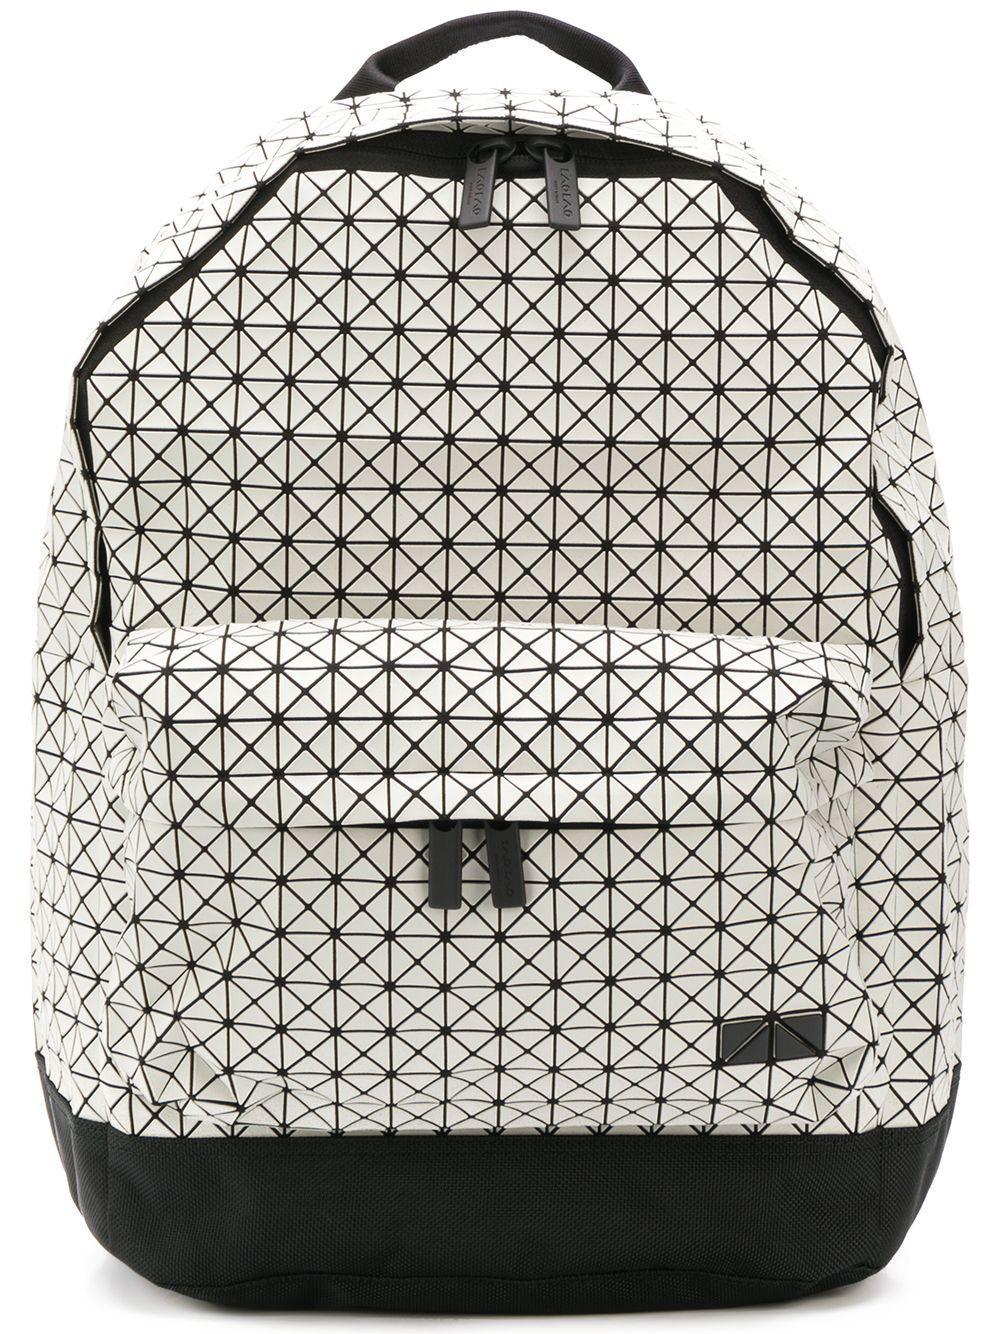 Bao Bao Issey Miyake Daypack Geometric Backpack in Natural for Men ... 0e243c40602fd